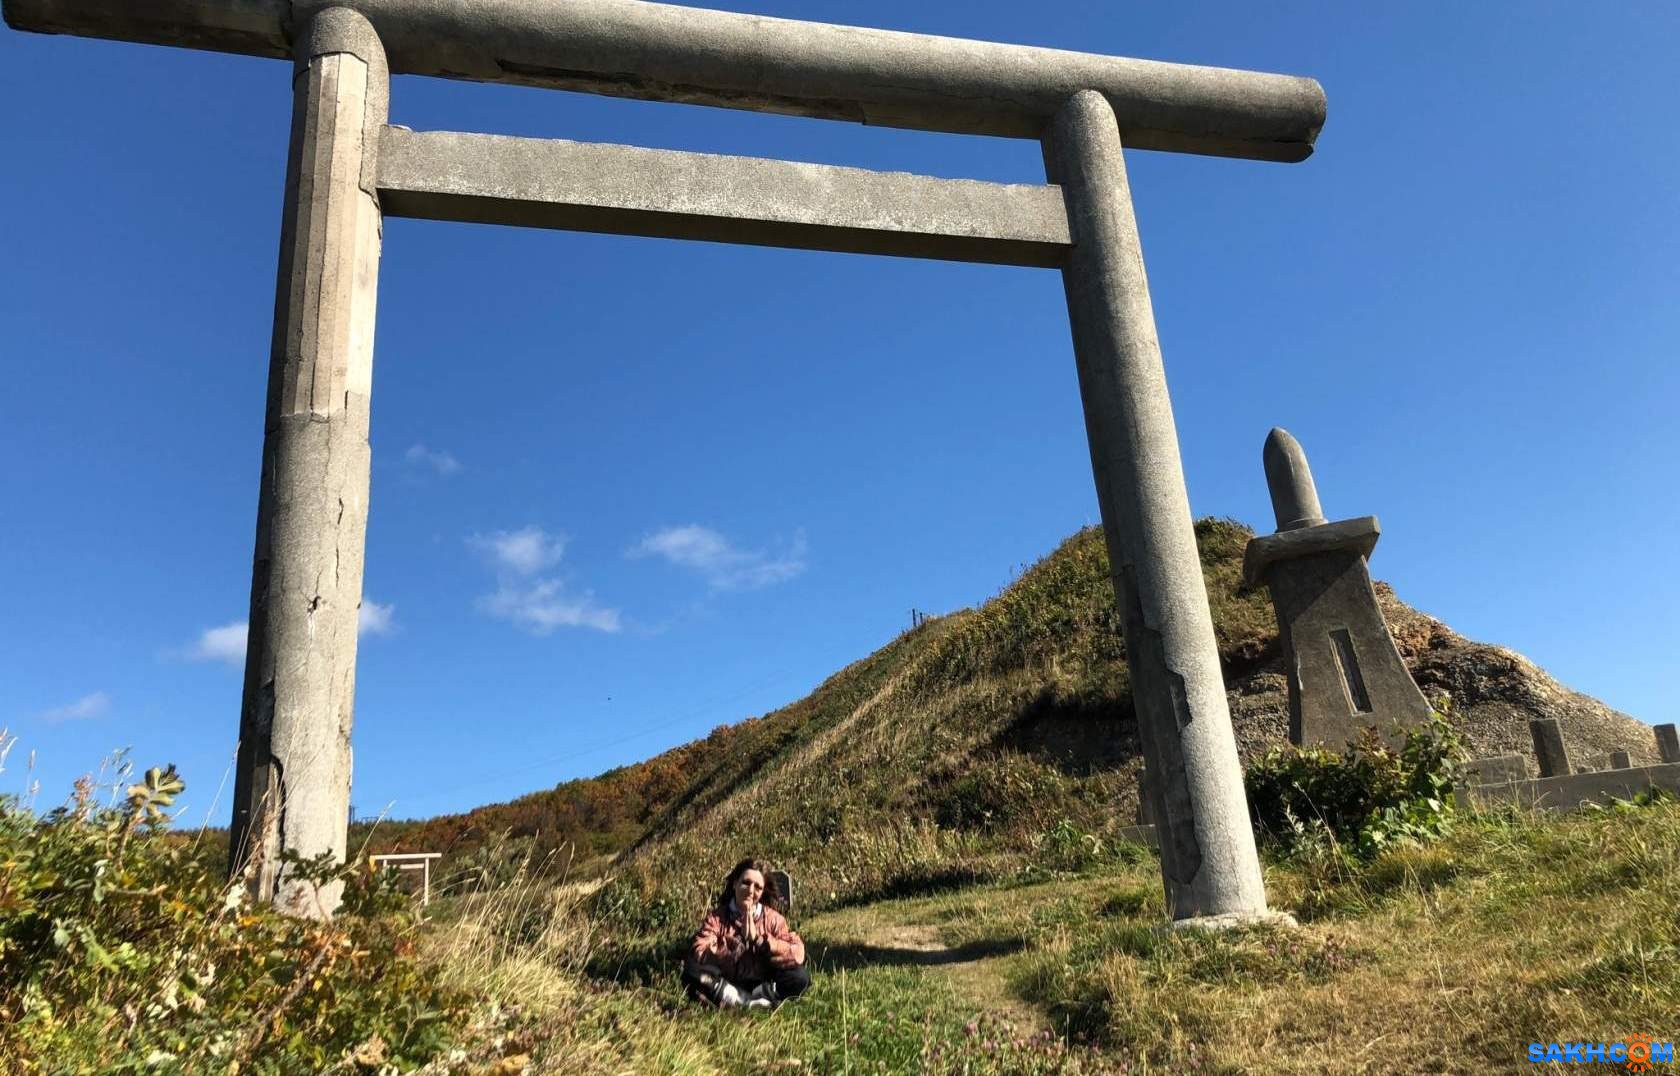 tasya: Тории, символические ворота японских времен